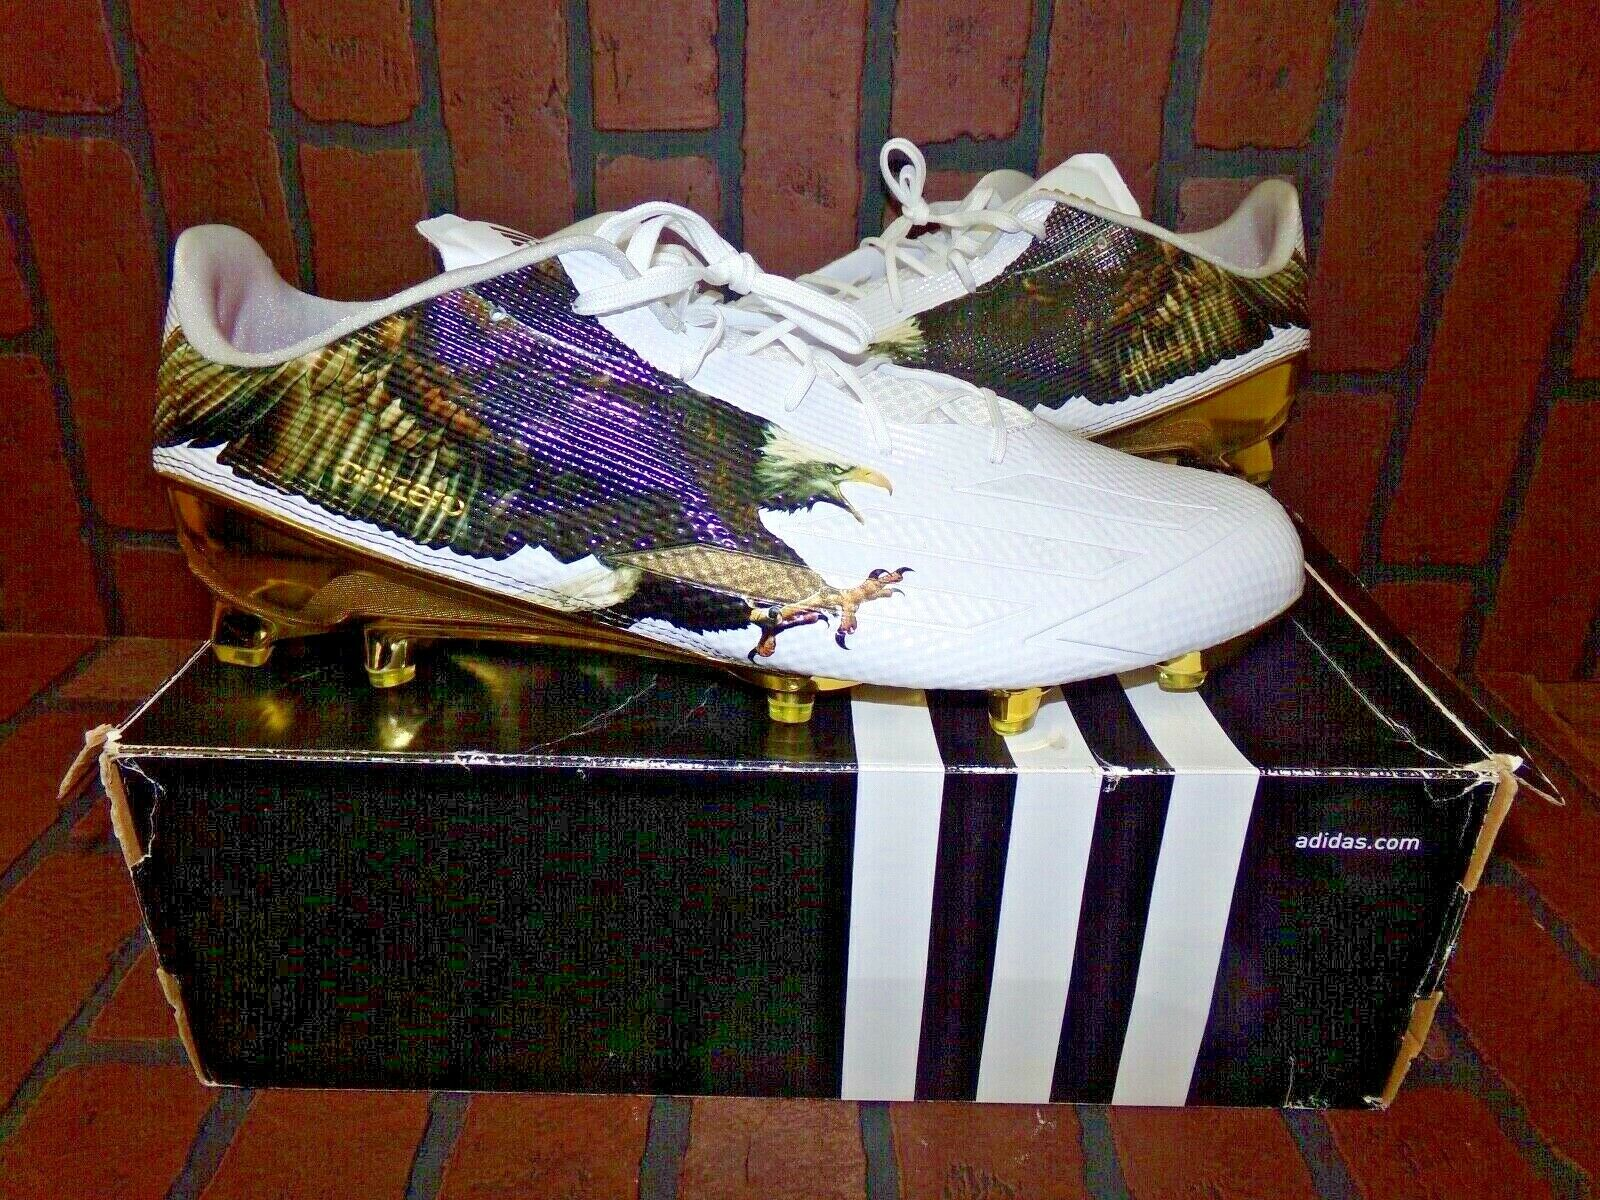 Adidas Adizero 5-Star 5.0 Uncaged  Eagle  Football Cleat Men's Size 18 B49350